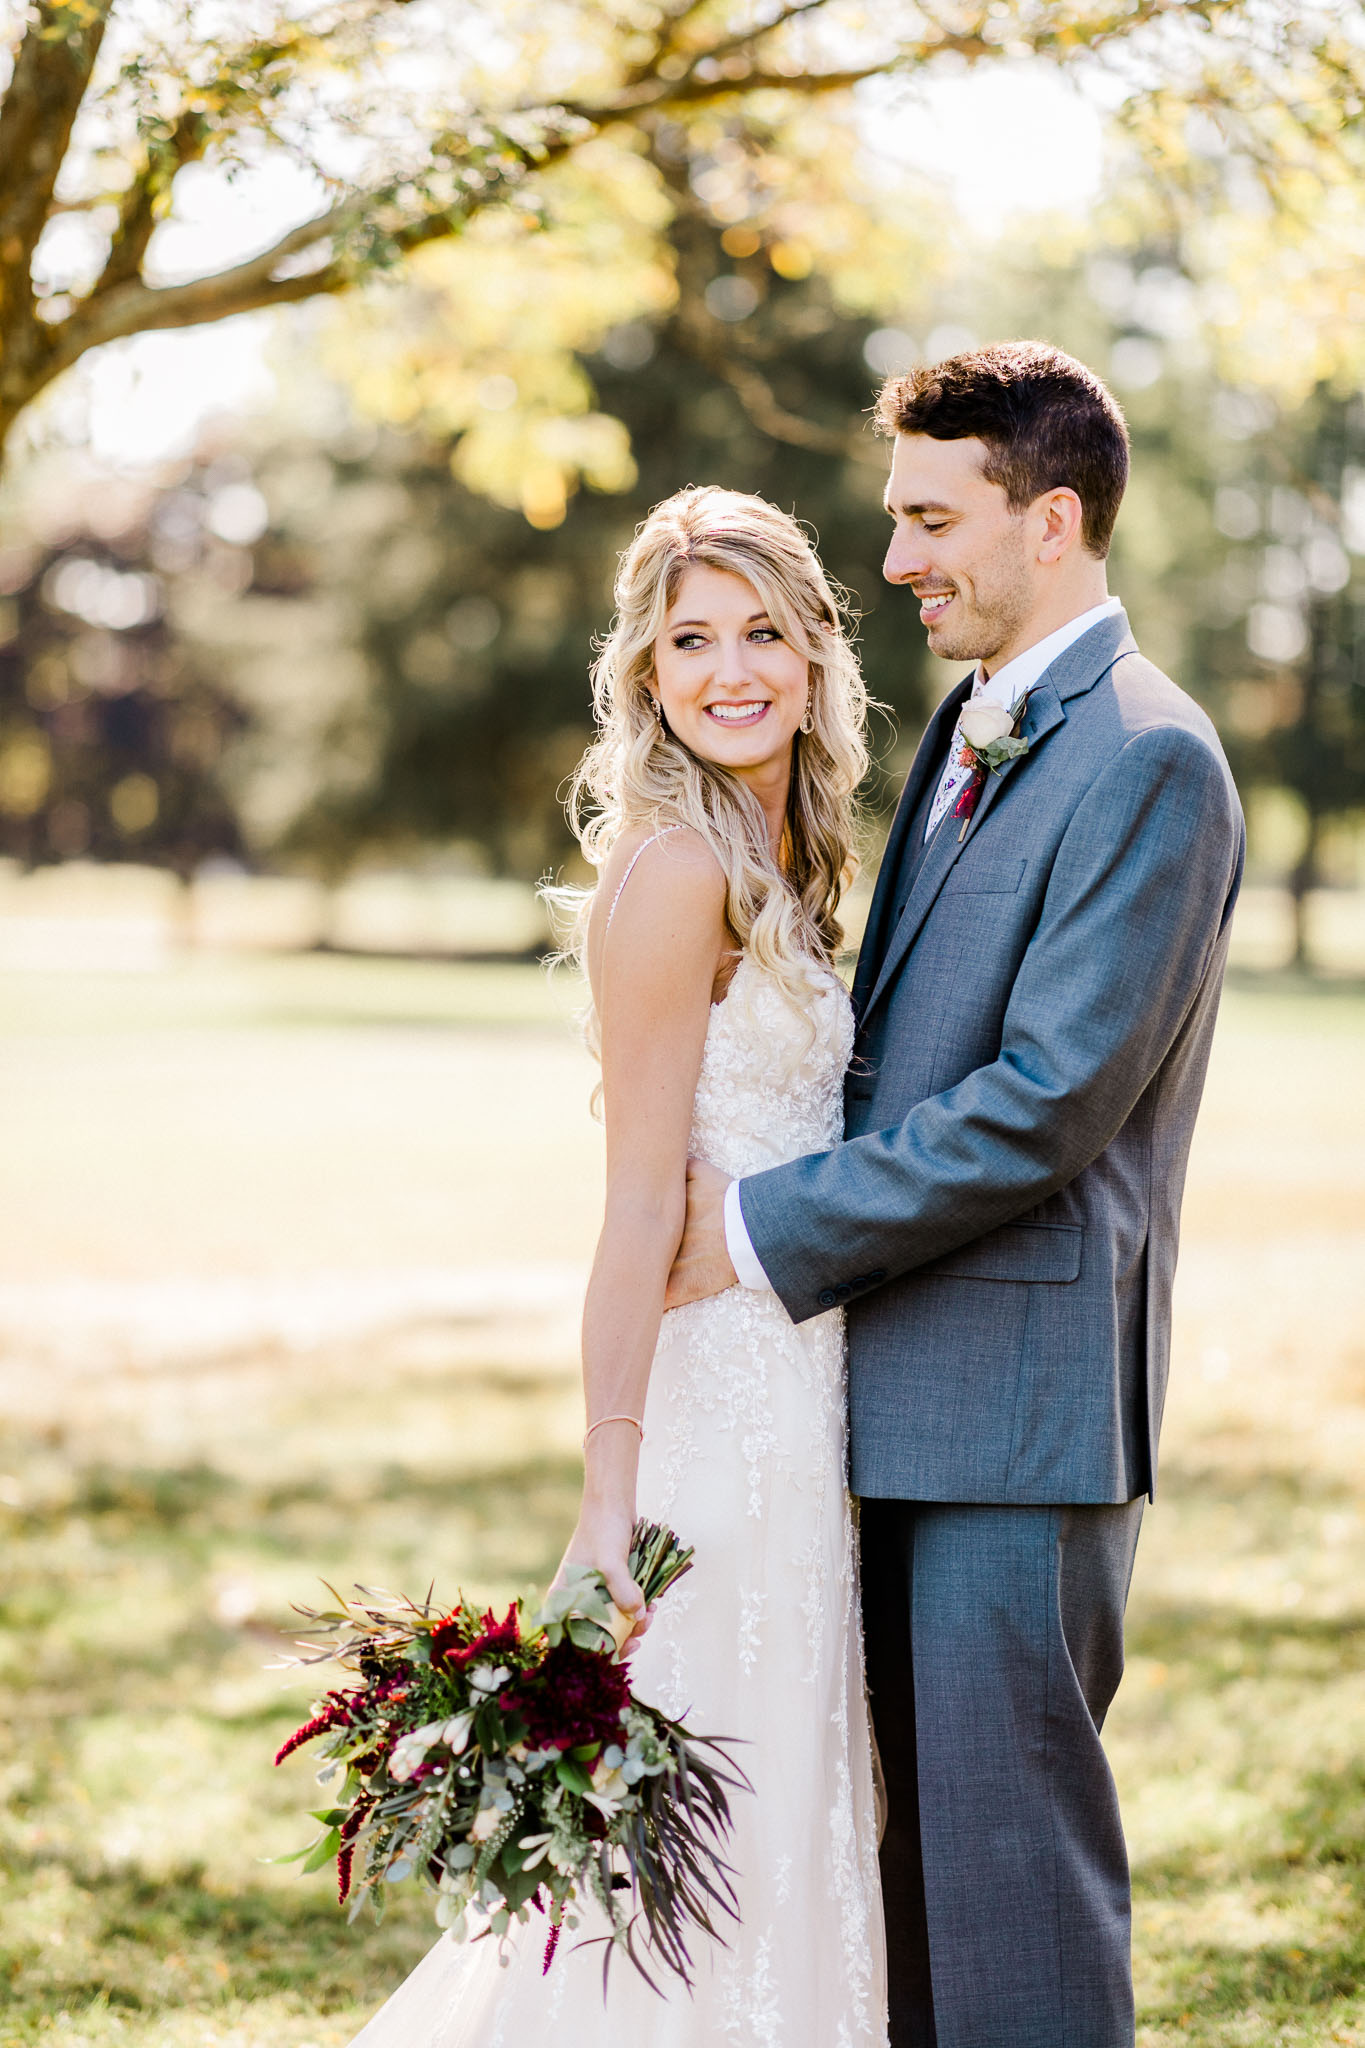 Frosty-Valley-September-Wedding-7483-2.jpg